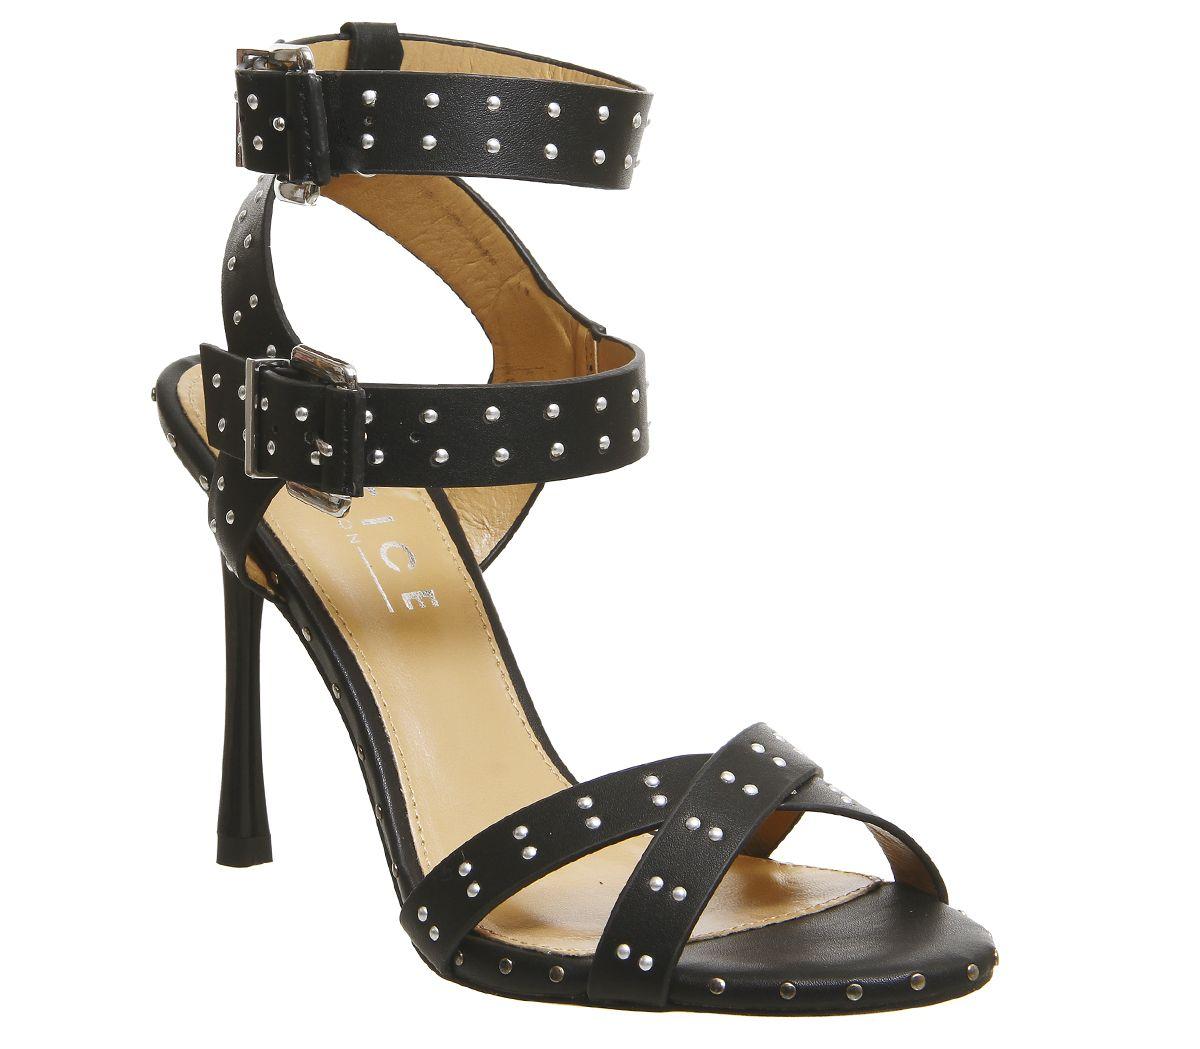 09dd9ac6563 Office Hardcore Studded Stiletto Heels Black - High Heels